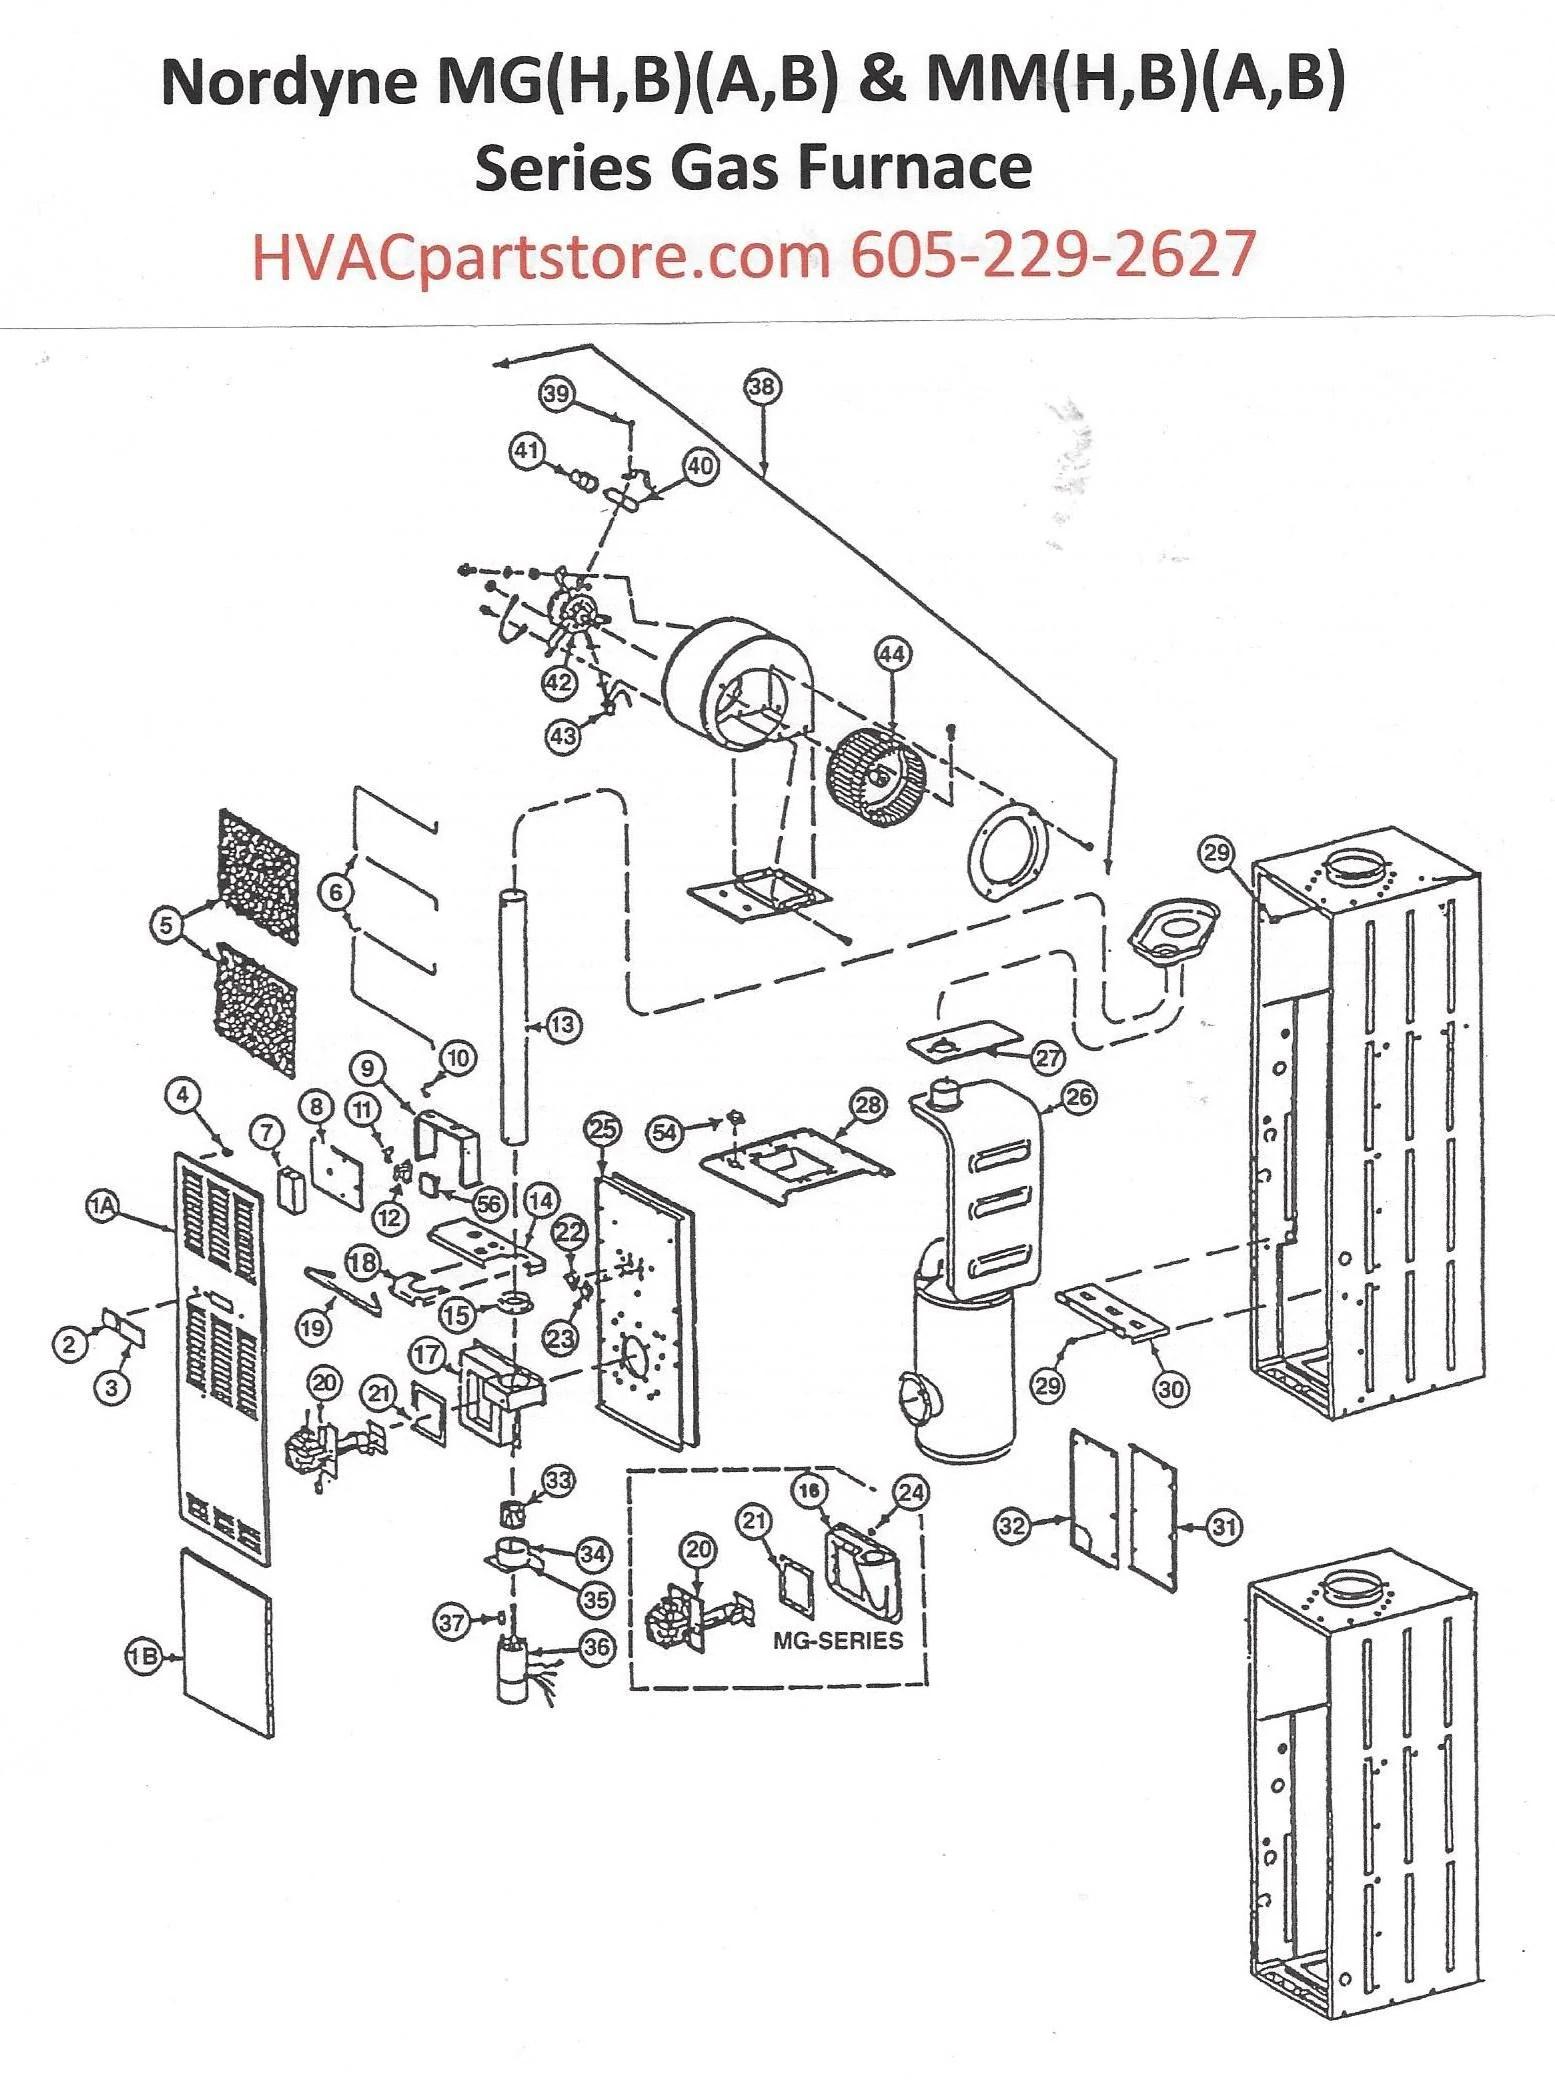 MGHA077 Nordyne Gas Furnace Parts – HVACpartstore